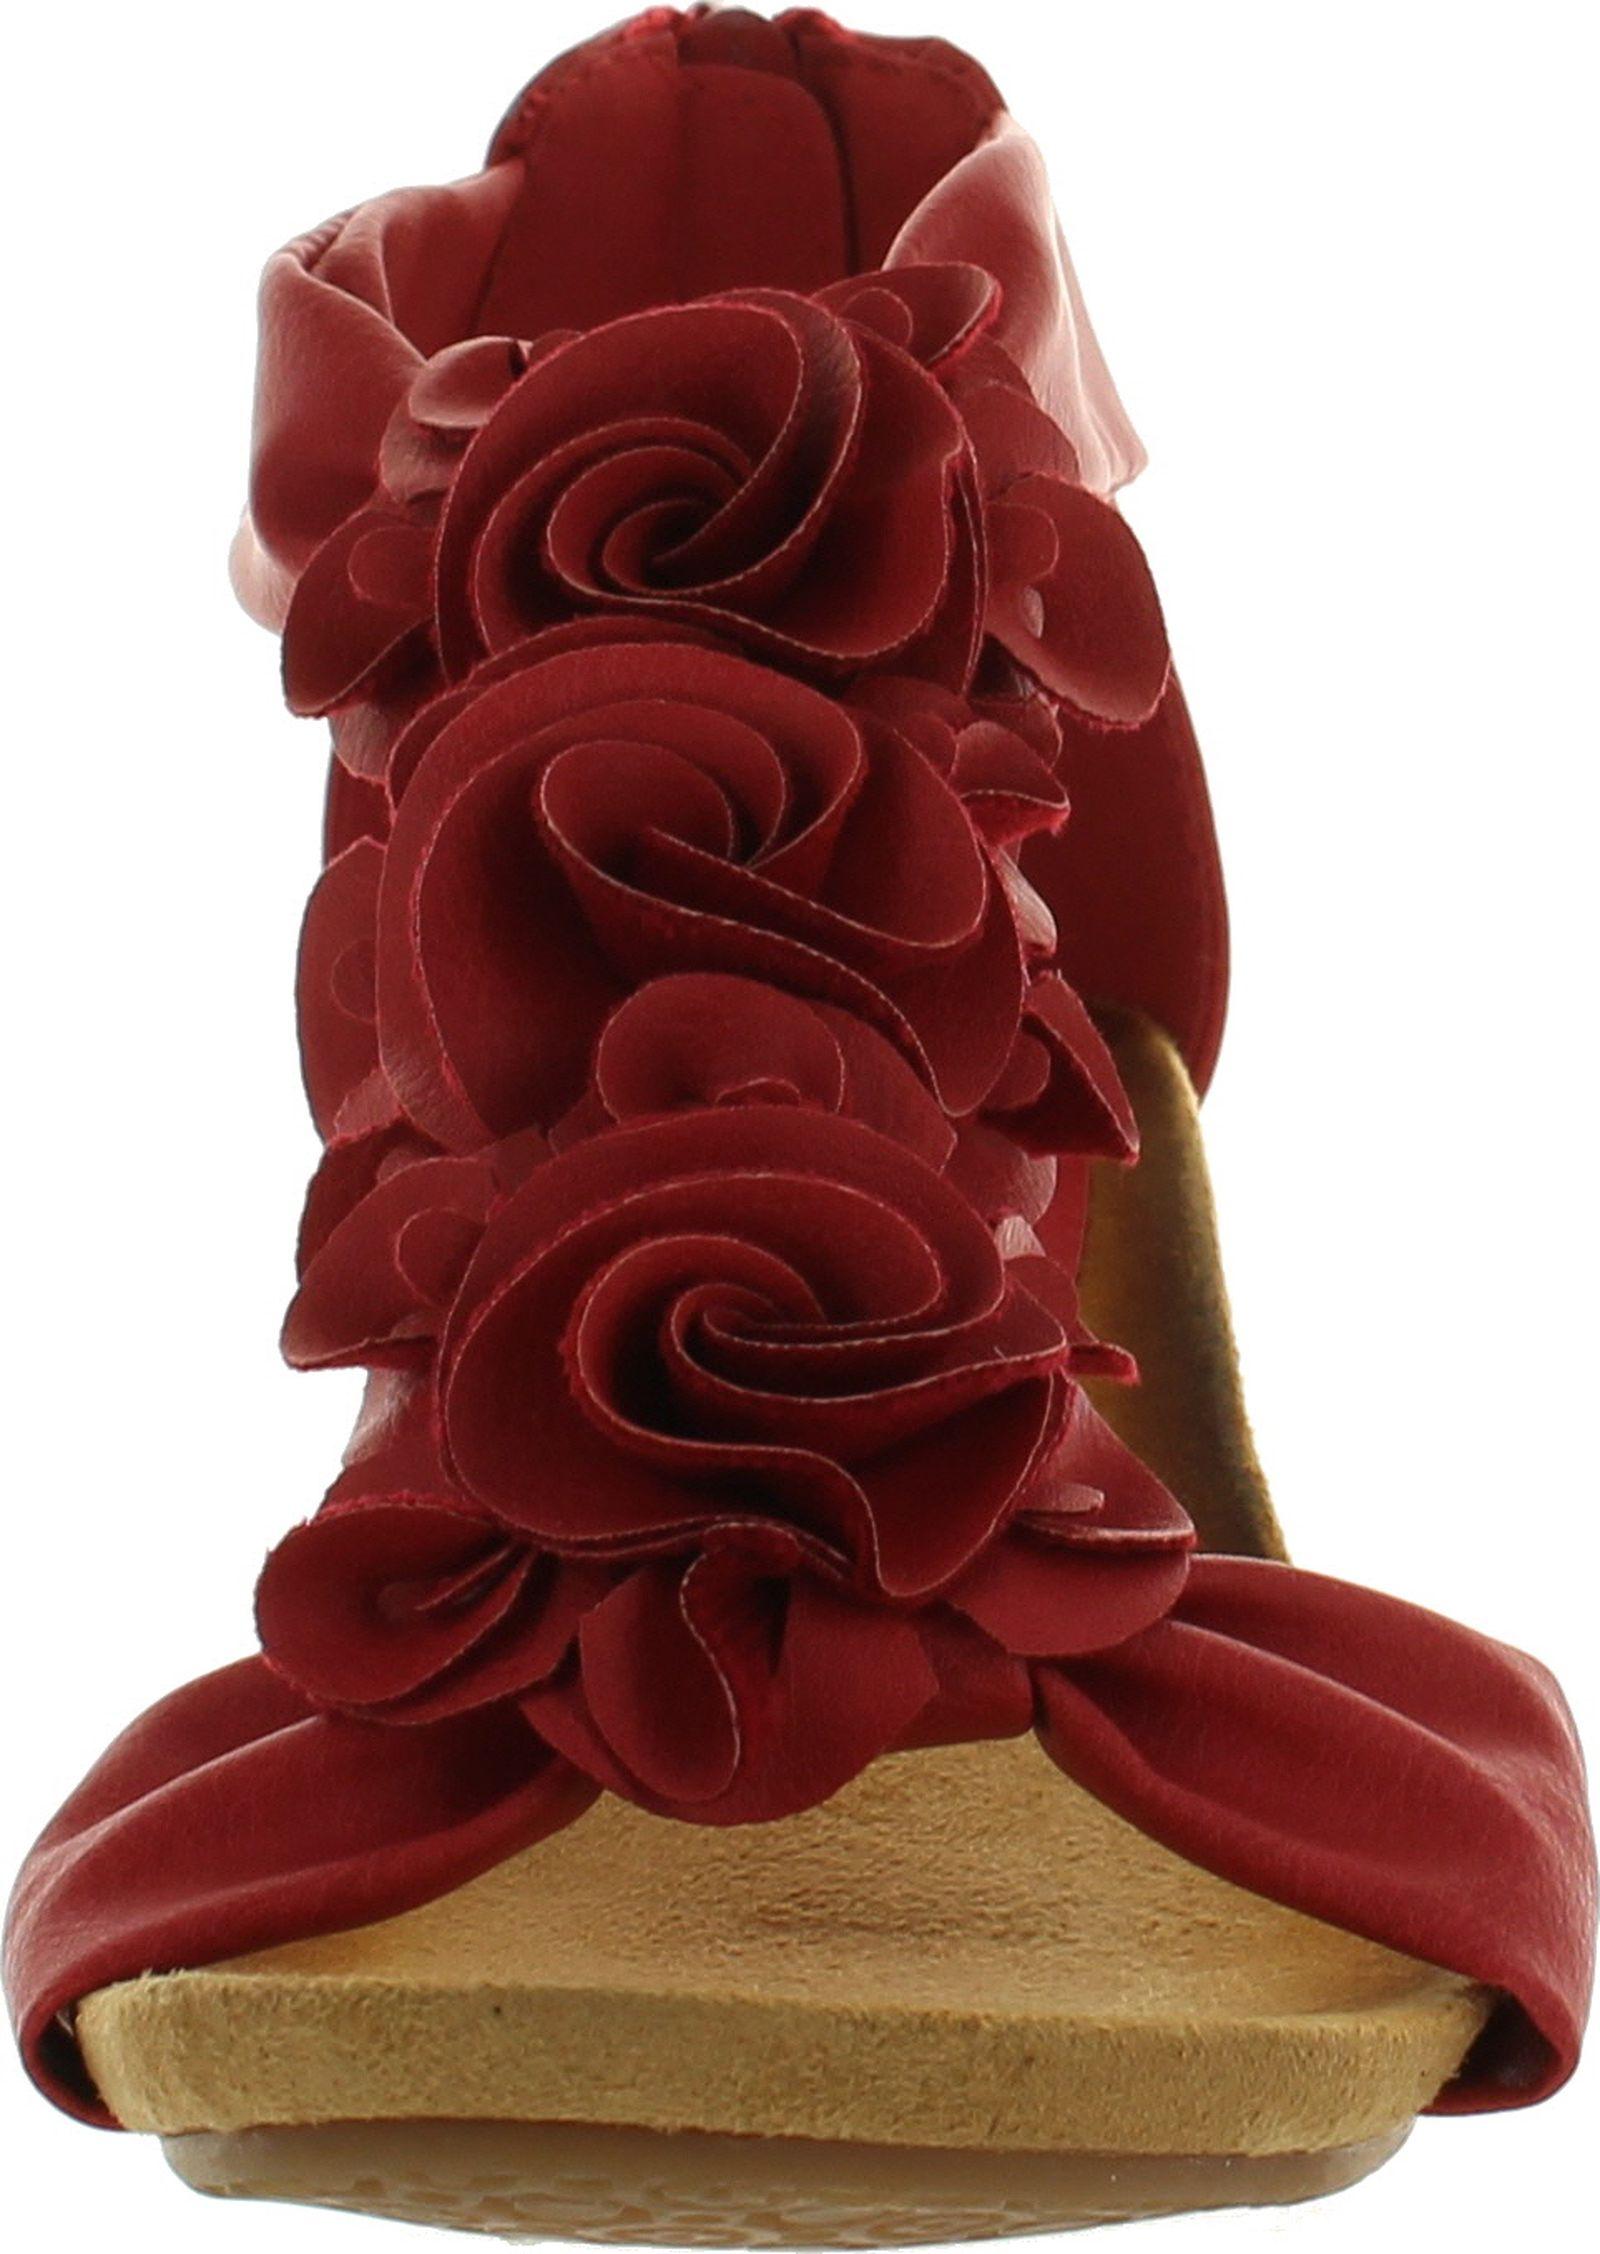 thumbnail 15 - PATRIZIA by Spring Step Womens Harlequin Fashion Wedge Sandals